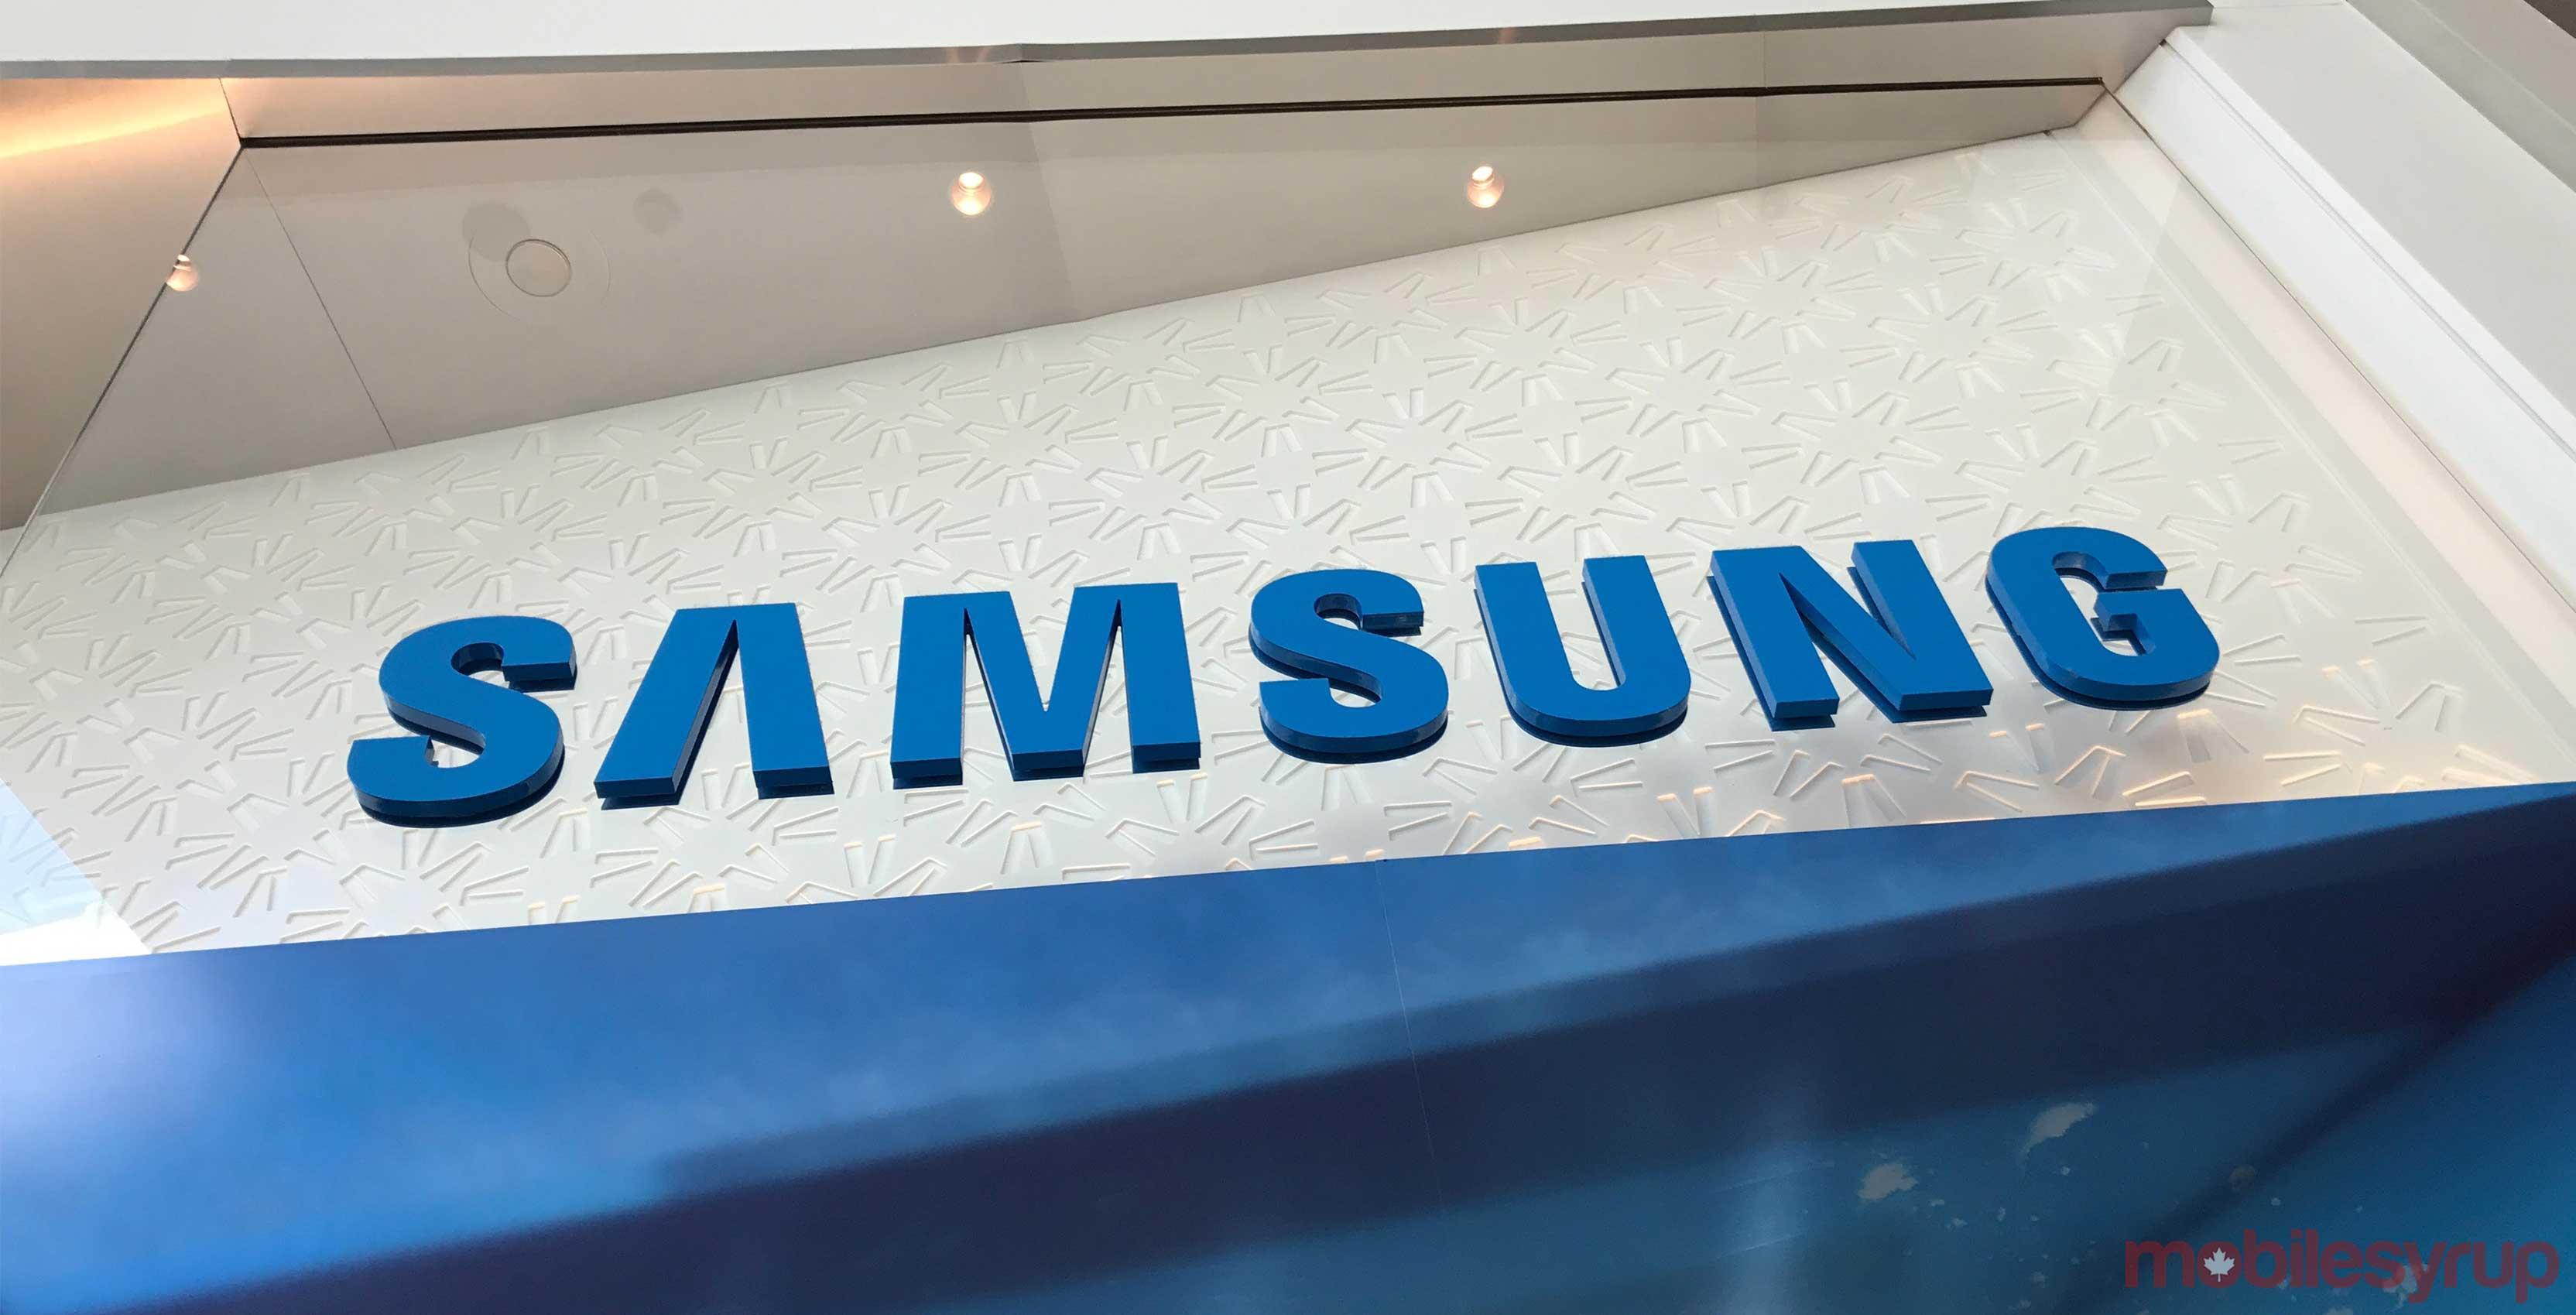 The blue Samsung store logo